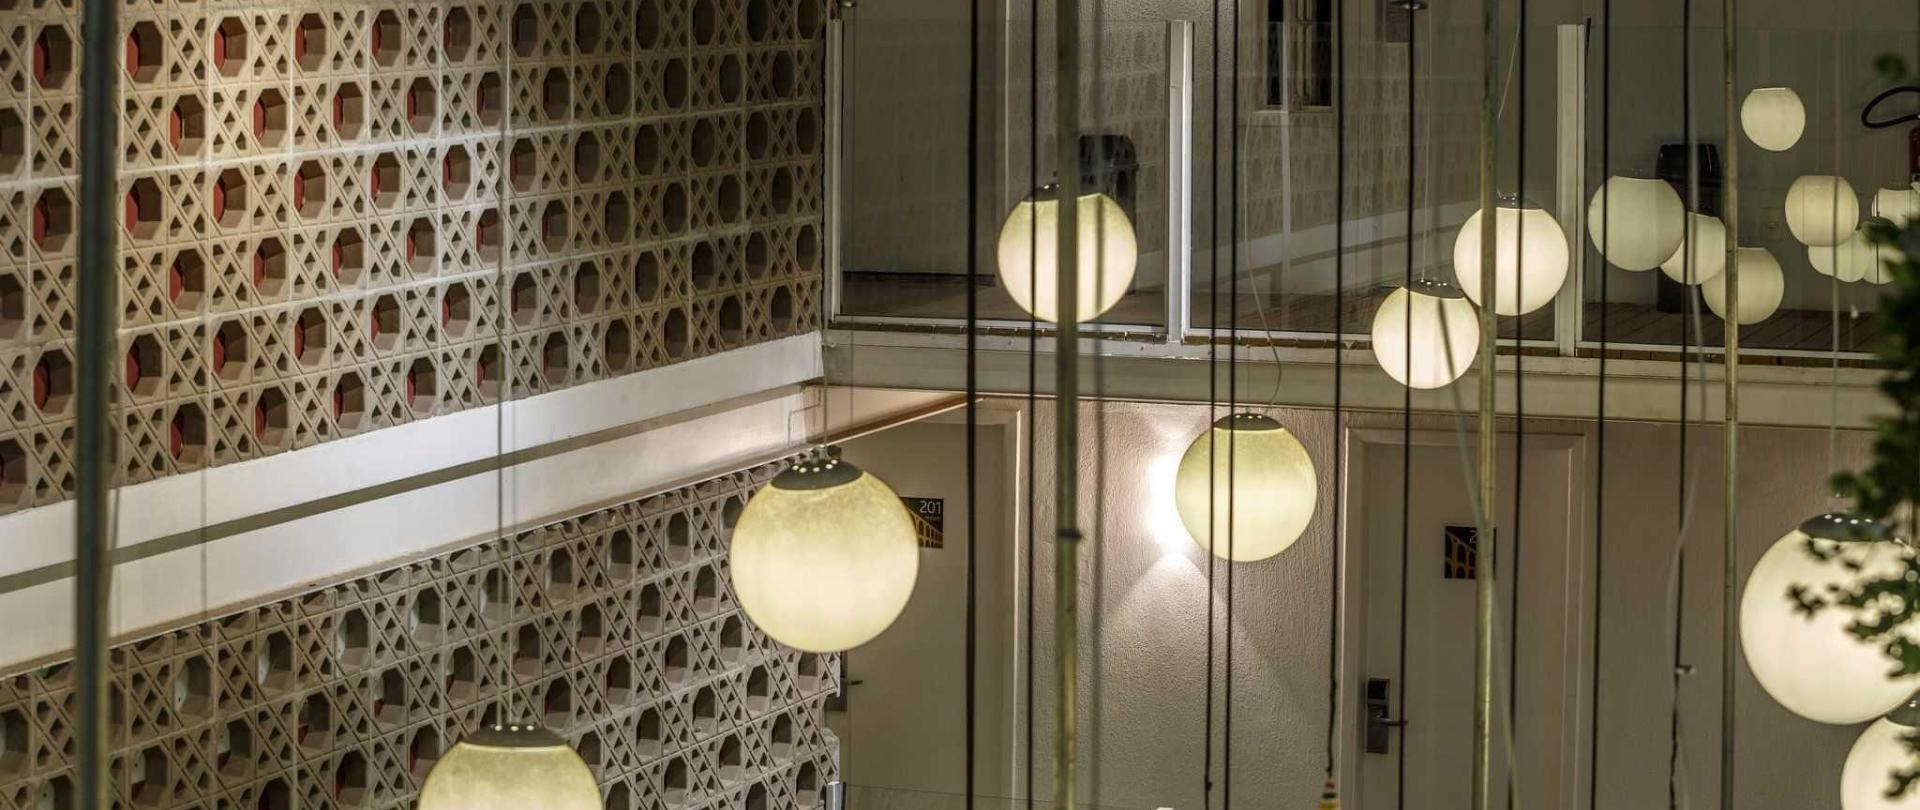 20160308_da_lapa_design_hotel_-_wlp_0147_-_tratada.jpg